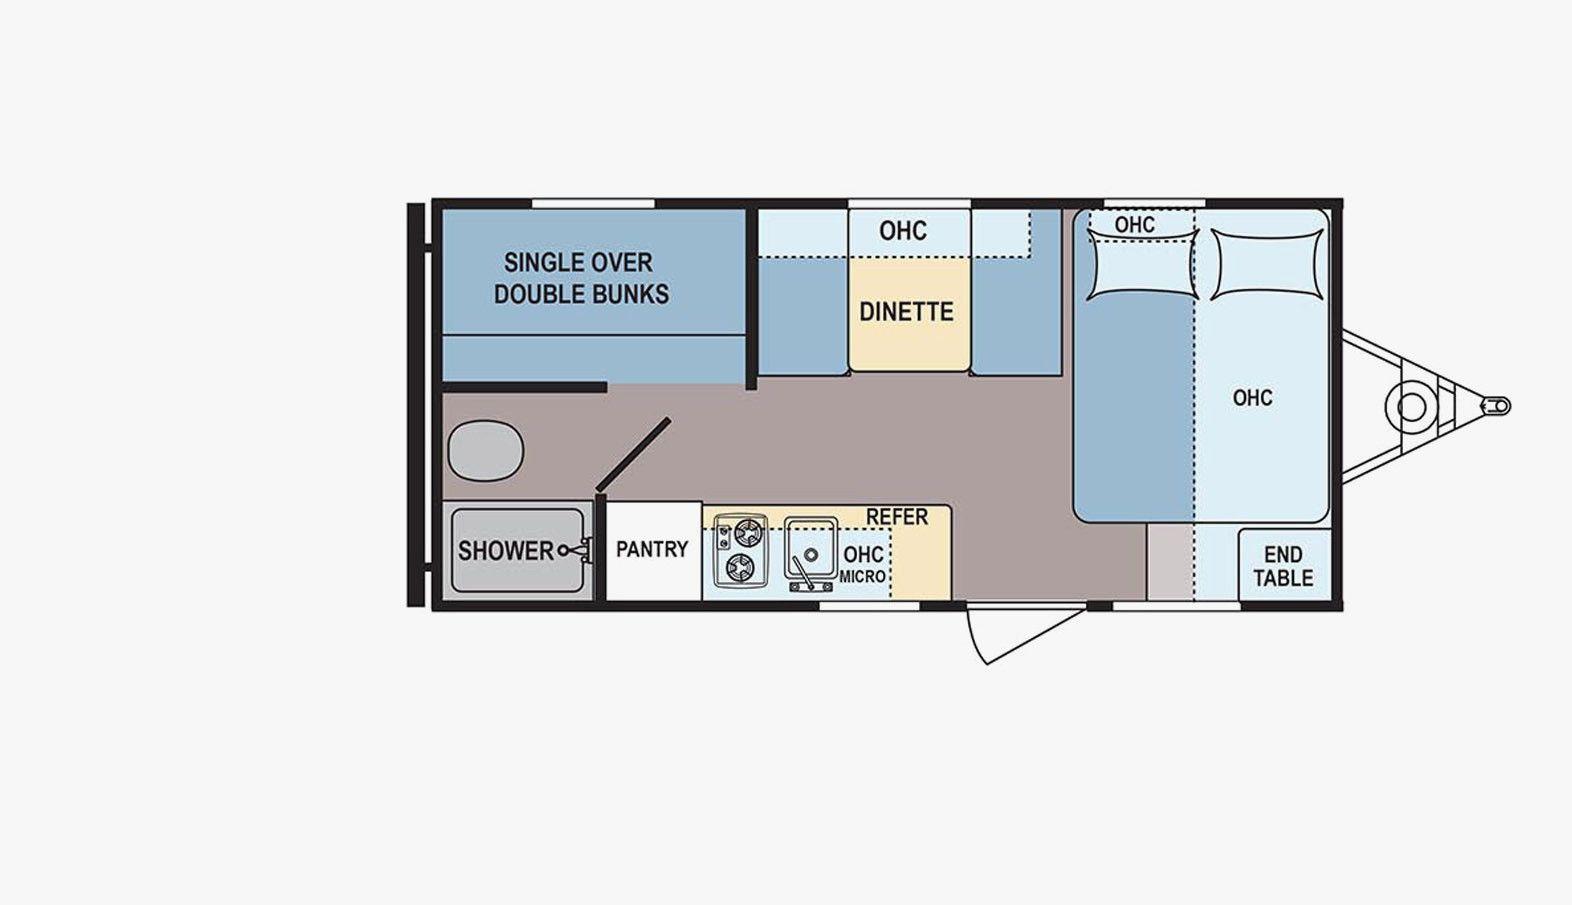 17 Foot Travel Trailer Floor Plans Inspirational New 2017 Dutchmen Coleman 17fq Travel Traile Travel Trailer Floor Plans Travel Trailer Coleman Travel Trailers